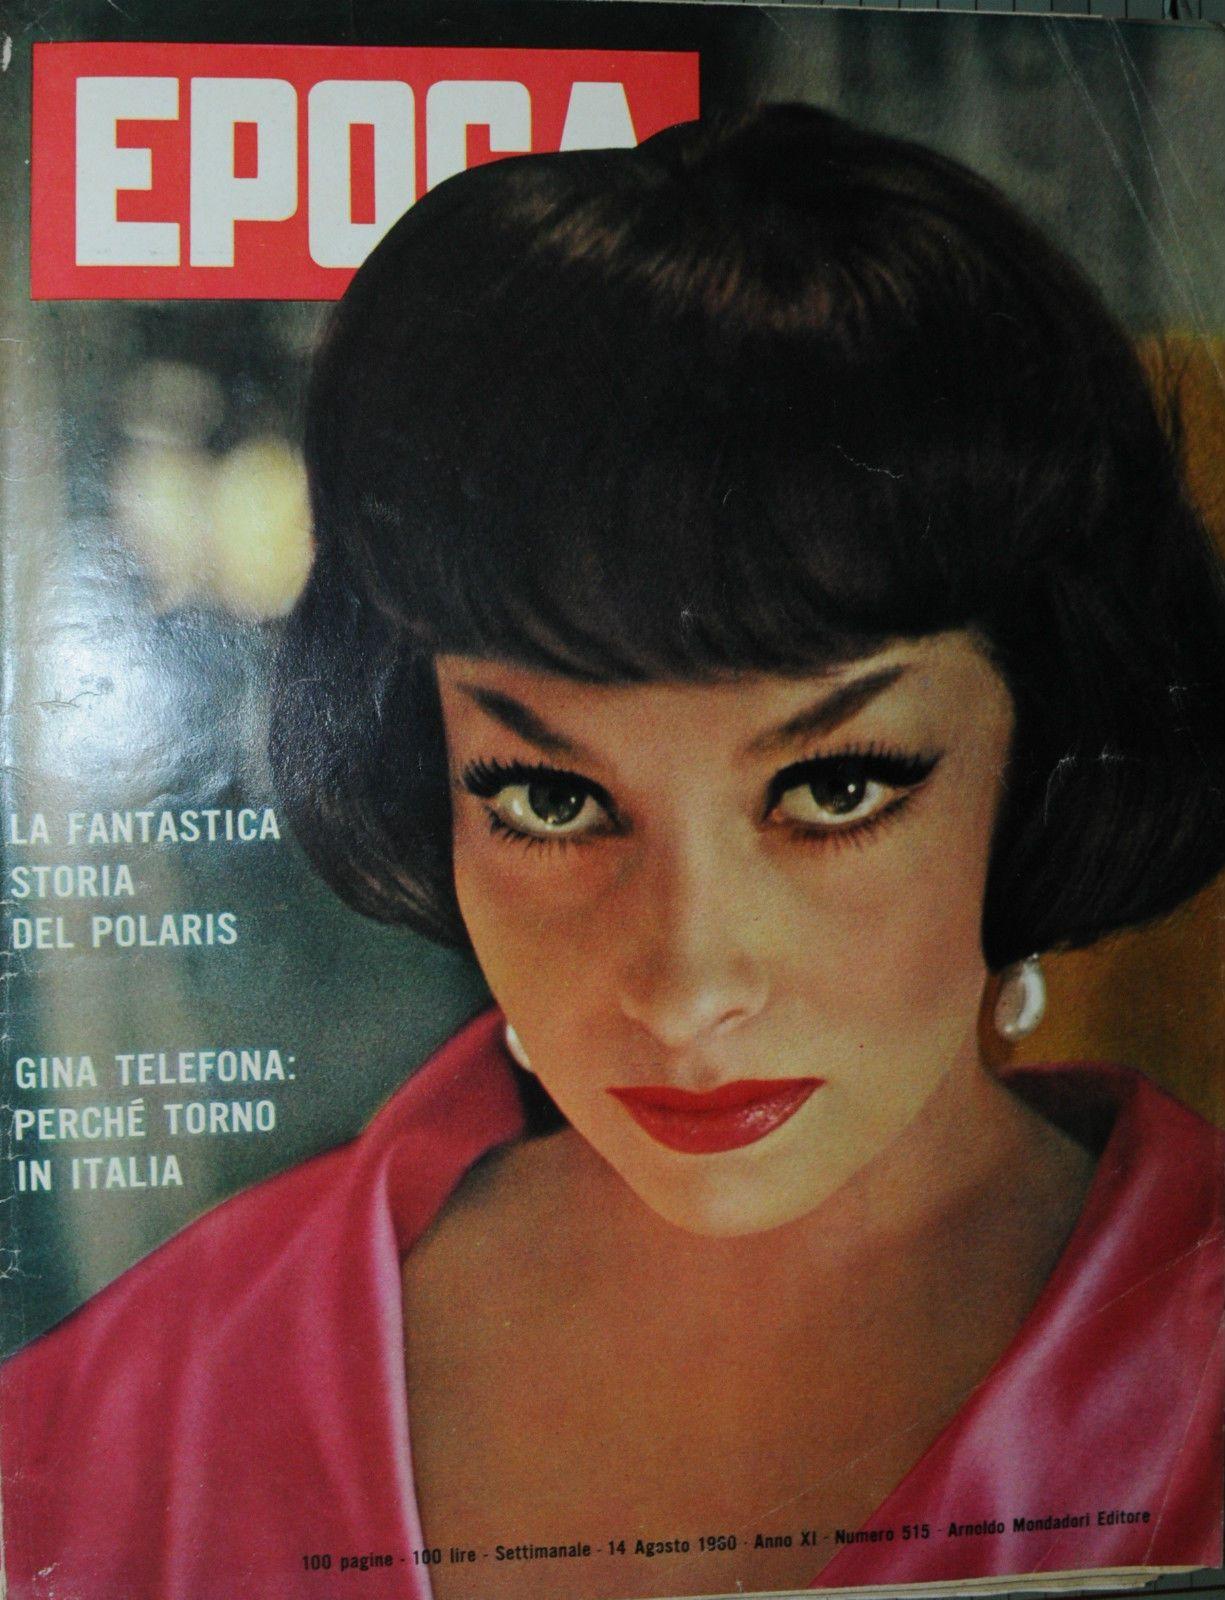 Epoca N°515 14 AGO 1960 Gina Lollobrigida Torna IN Italia IL Governo Fanfani | eBay